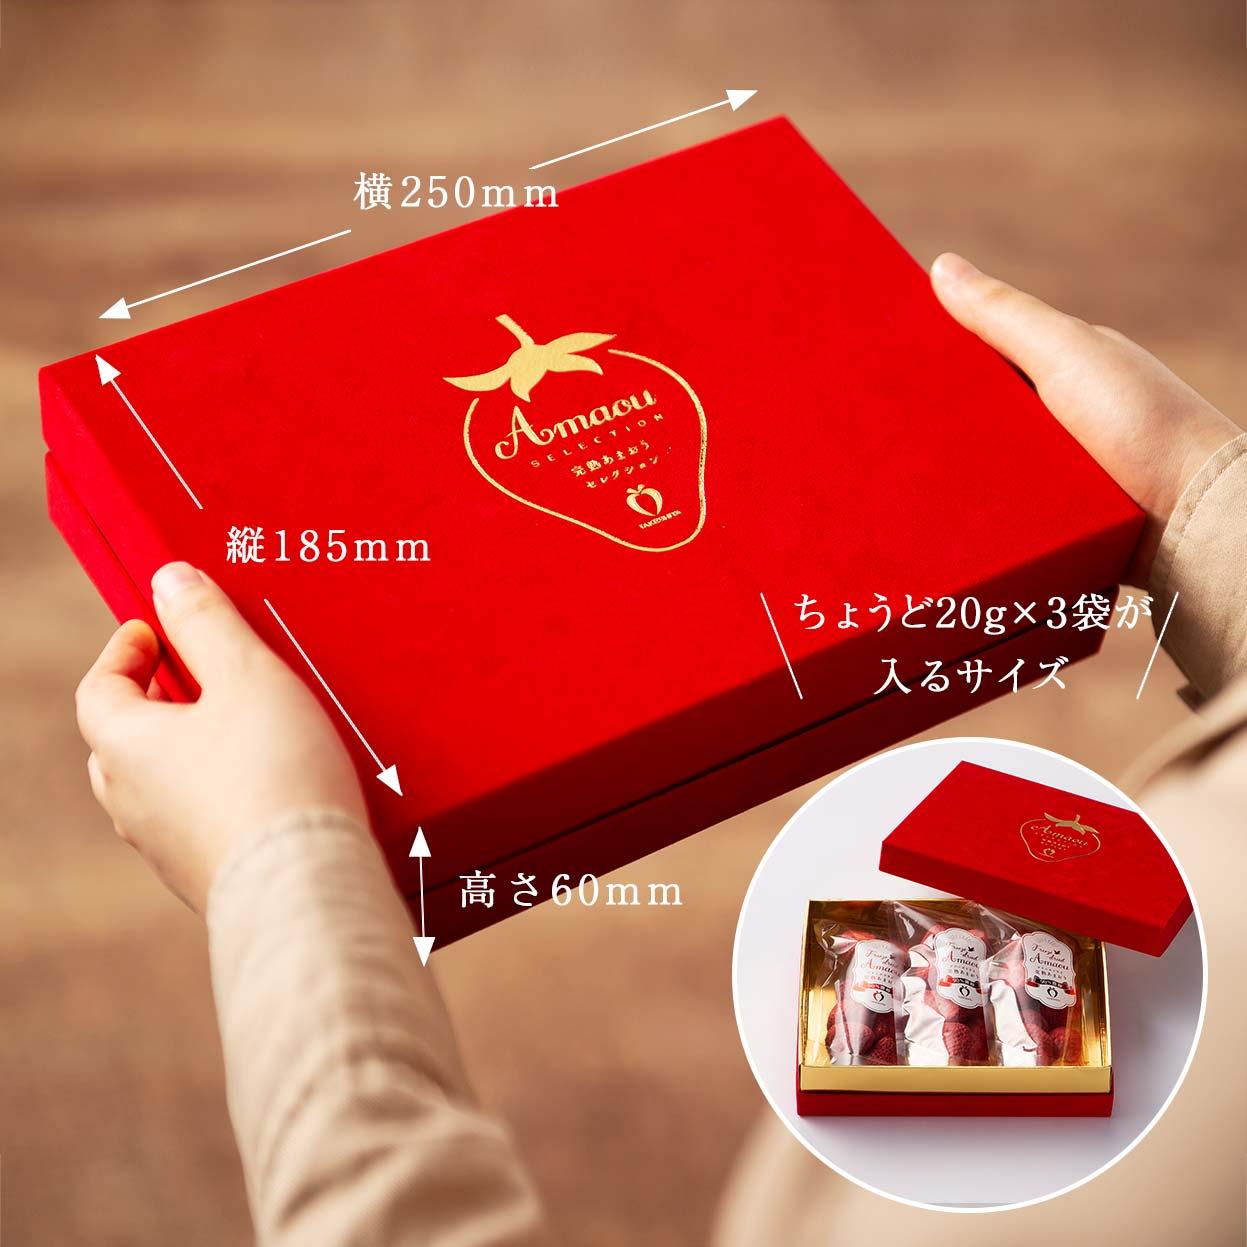 VIPボックス赤 フリーズドライあまおうセット20g×3袋